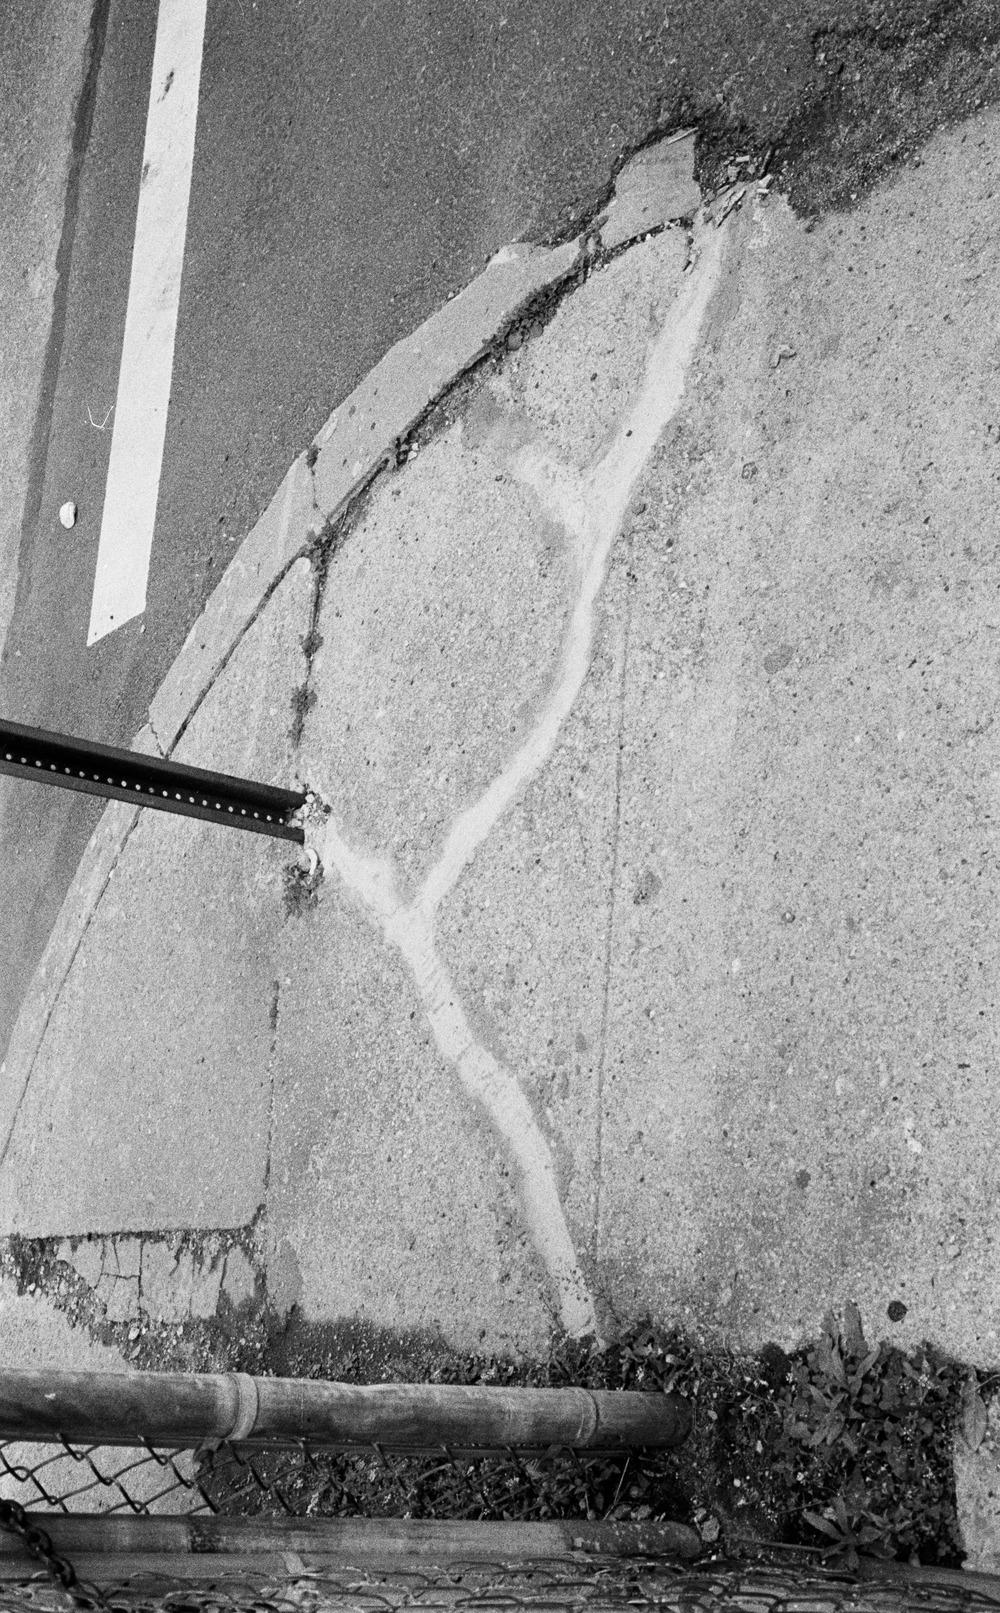 SidewalkLightningRockawayh.jpg